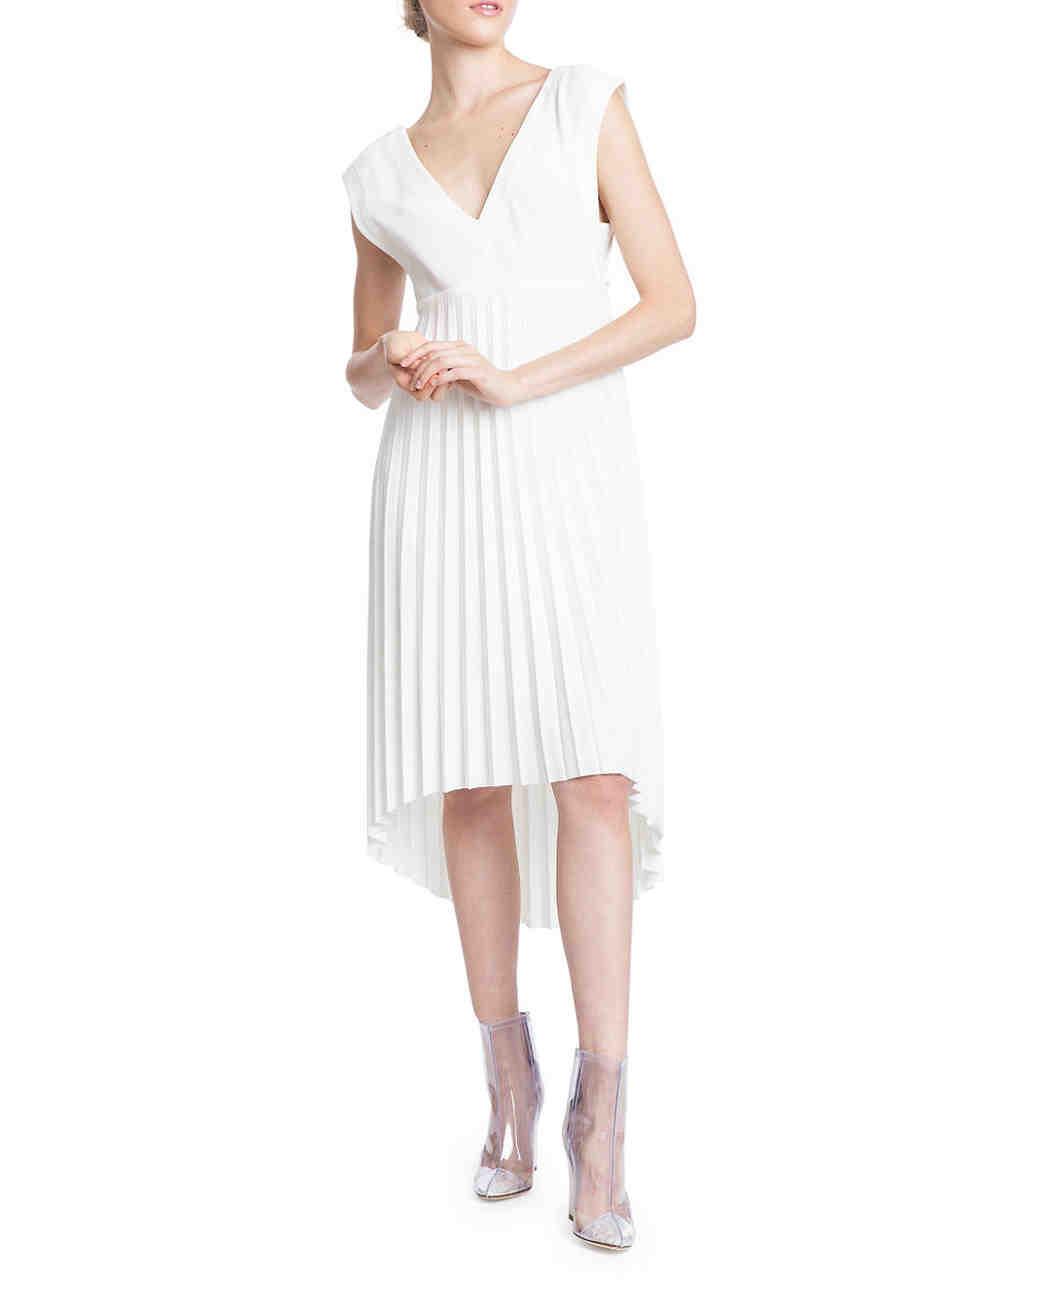 bridal-shower-dress-tracy-reese-pleated-dress-0416.jpg